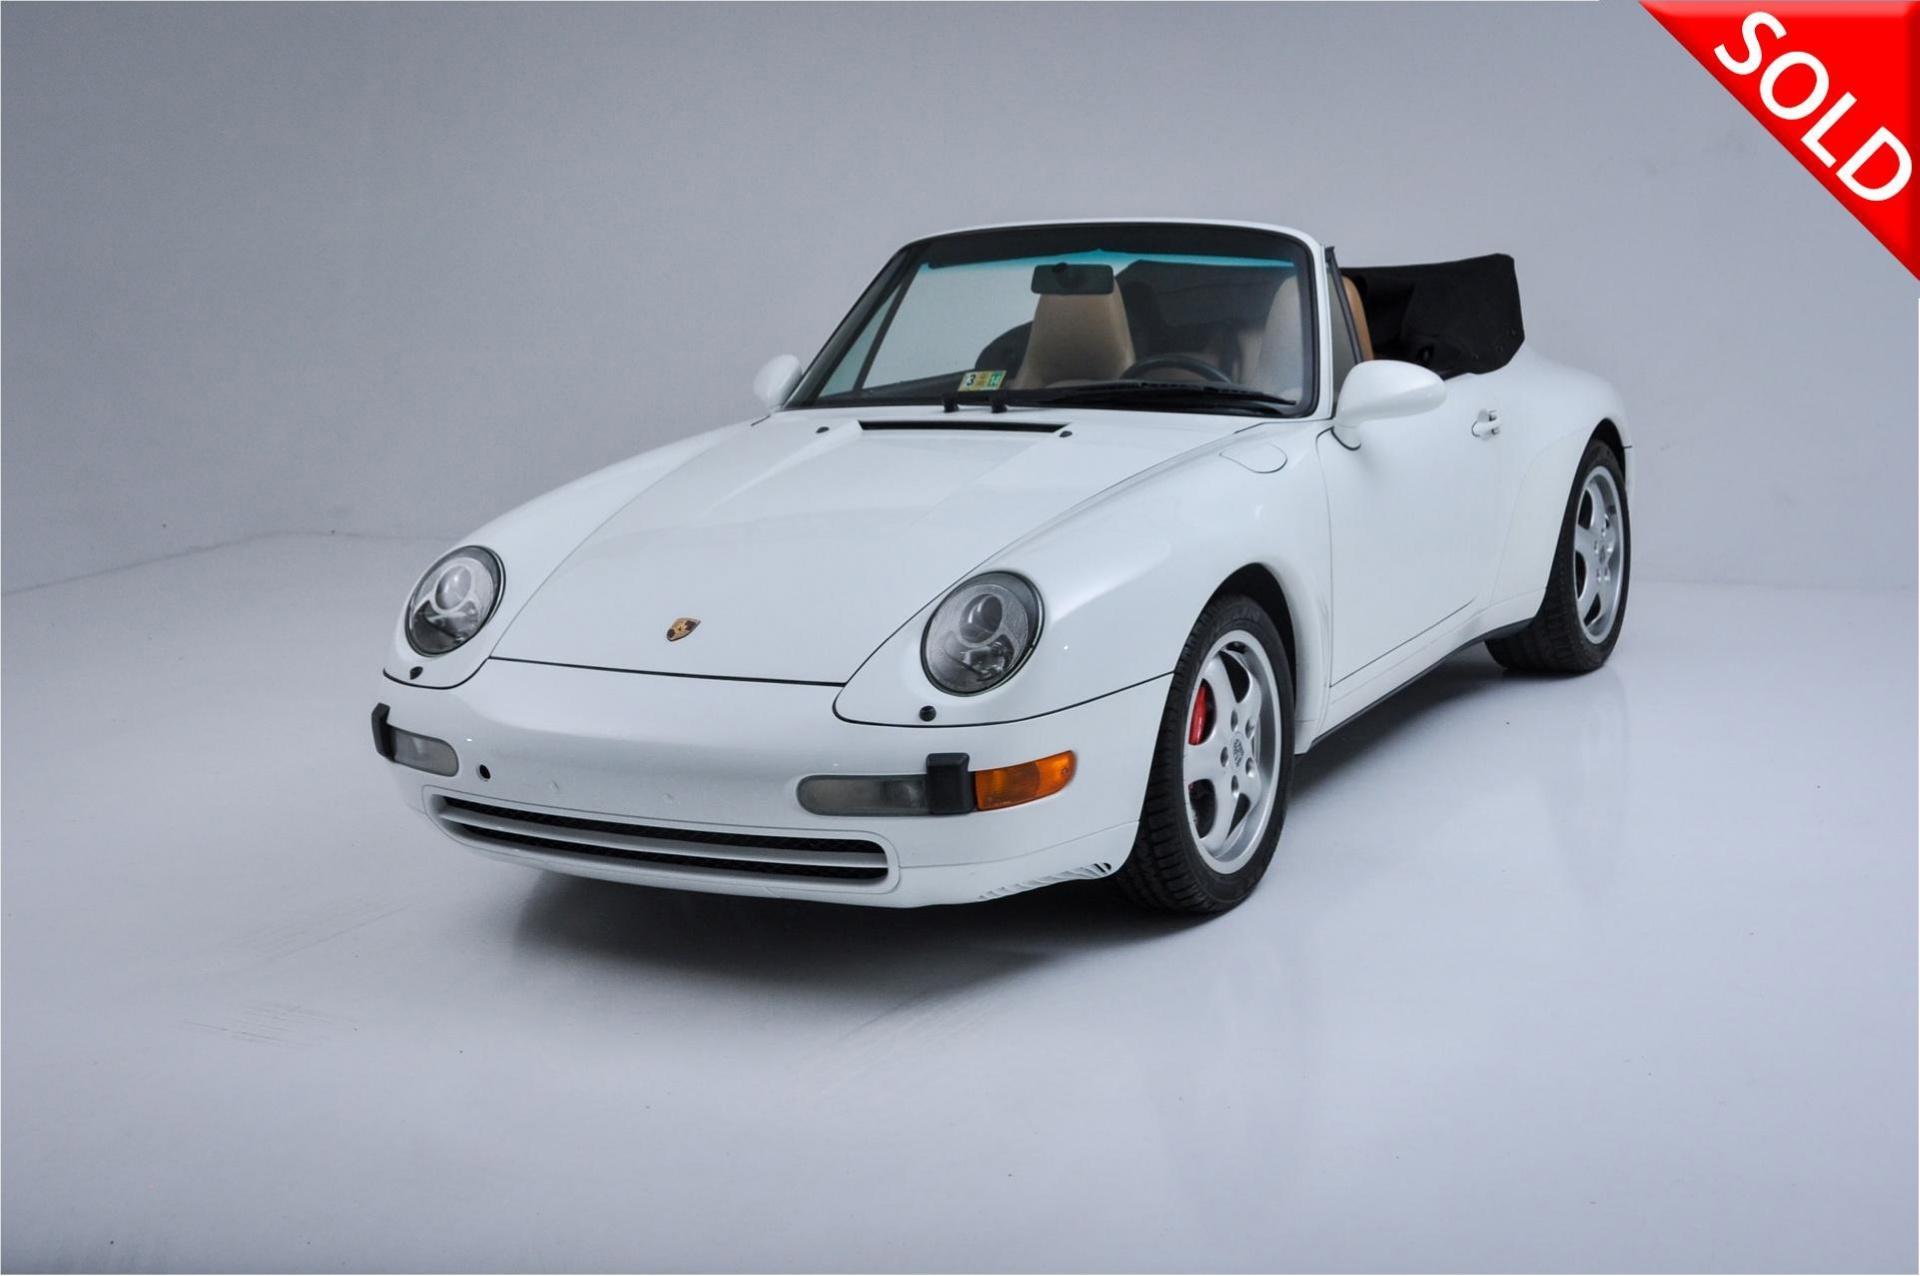 Used 1995 Porsche 993 Carrera 2 Cabriolet Carrera 2 | New Hyde Park, NY